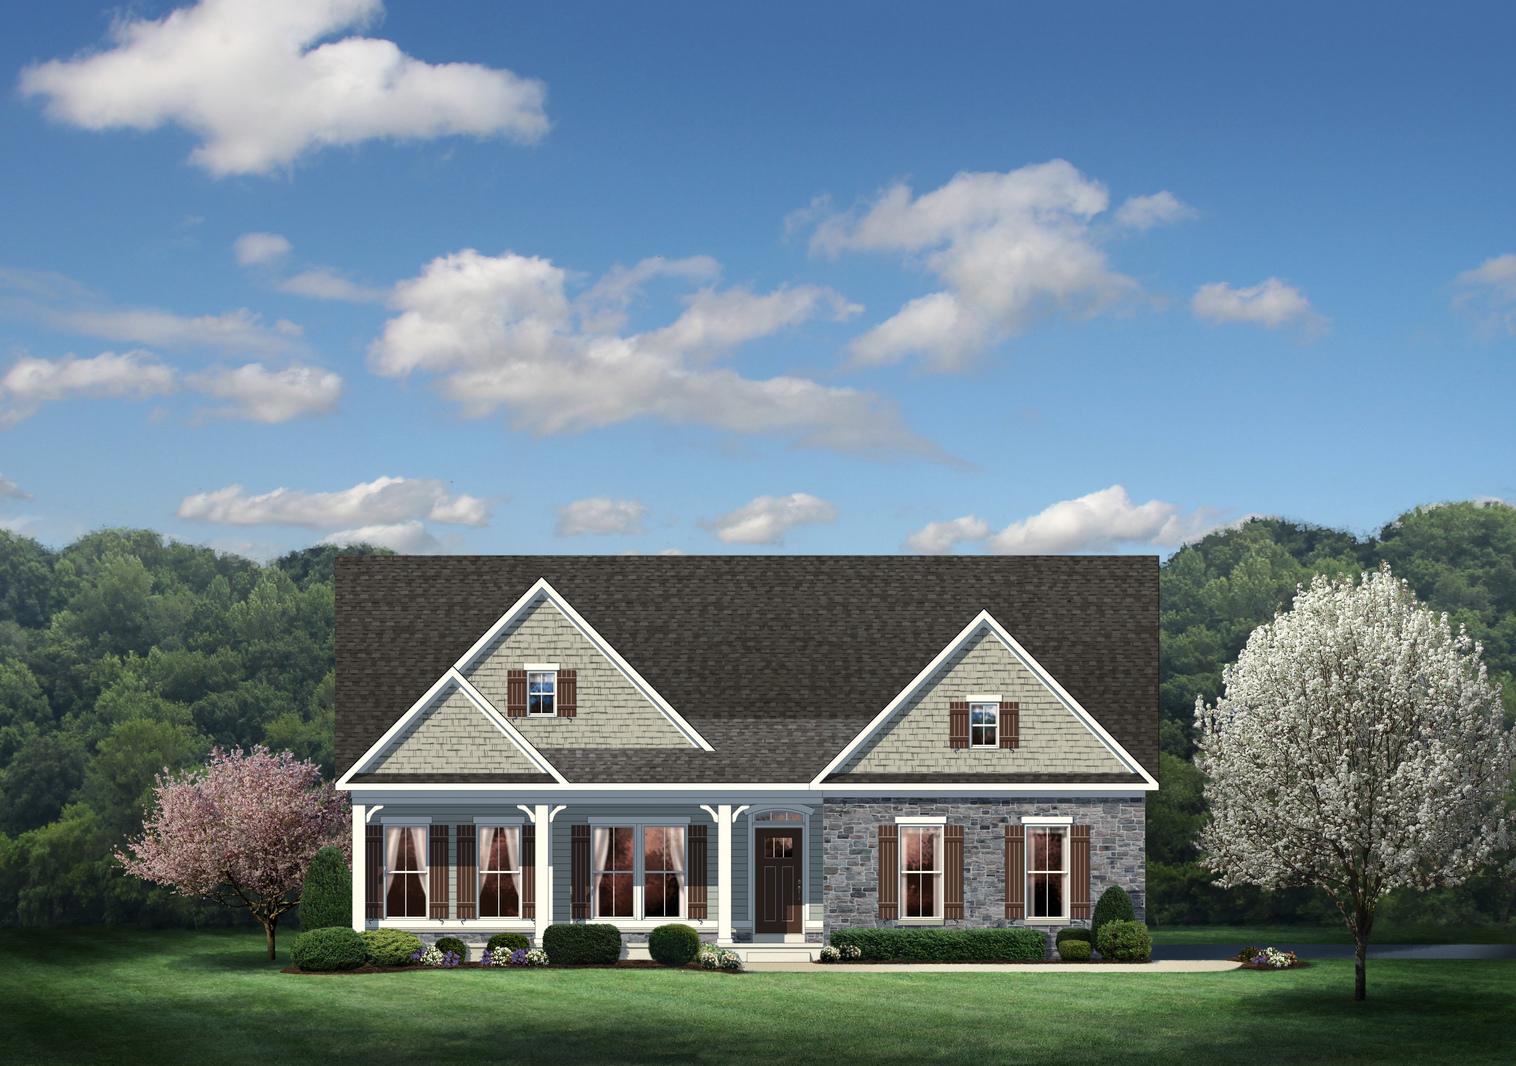 New Carolina Place Home Model For Sale Heartland Homes